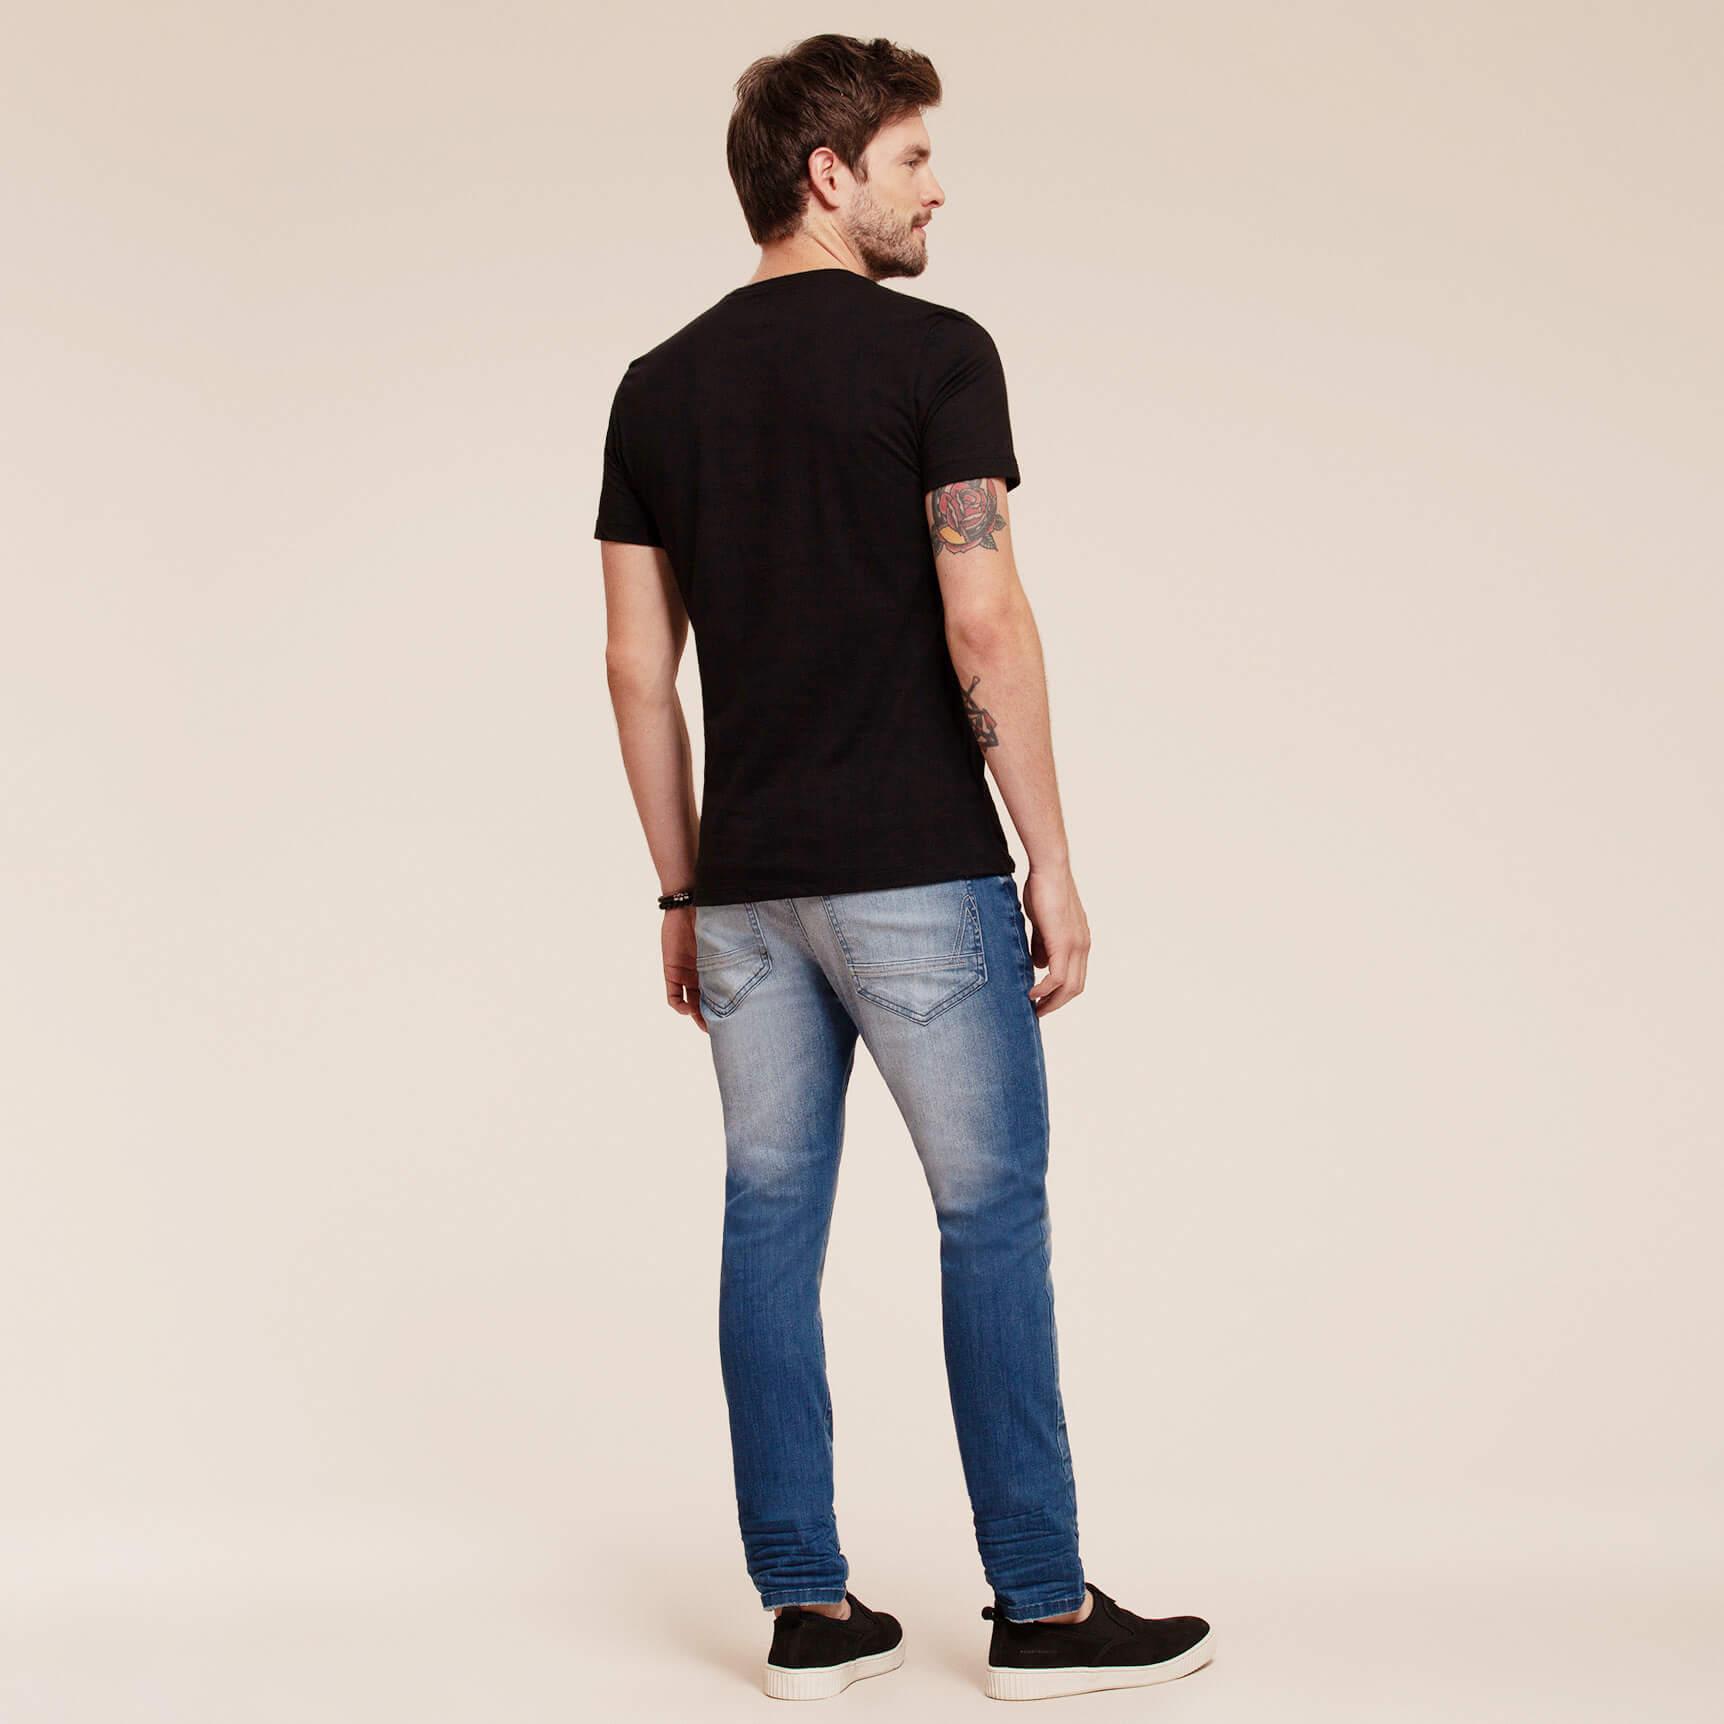 Camiseta Manga Curta Estampa Lobo - Acostamento